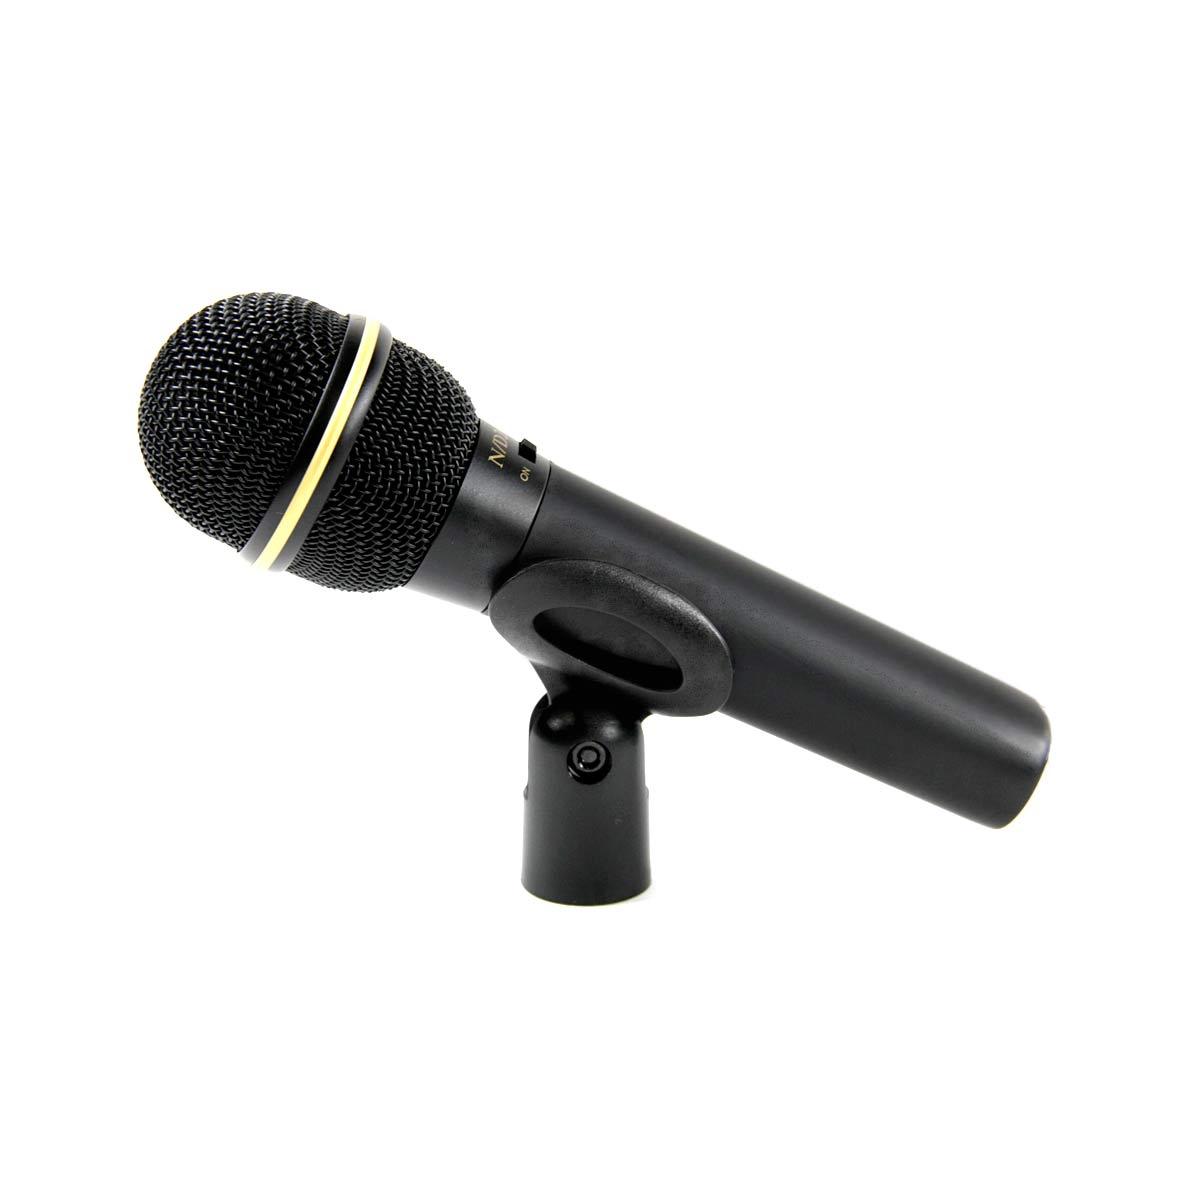 Microfone c/ Fio de Mão Dinâmico - ND 267 AS Electro-Voice